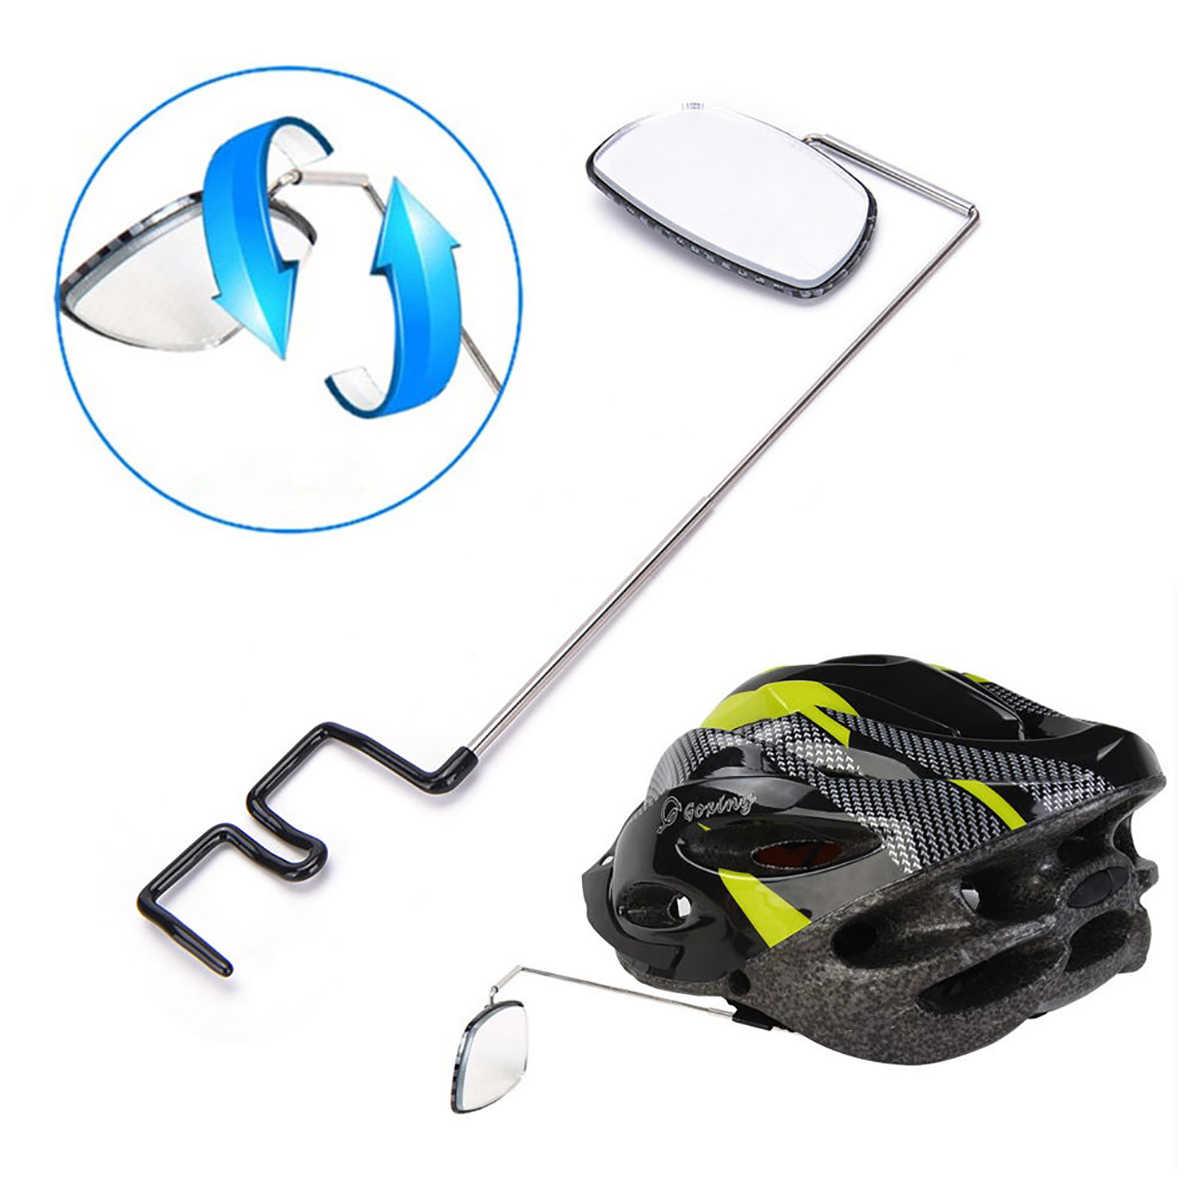 Cycling Rear View Helmet Mount Aluminium Alloy Riding Mirror Bicycle Adjustable